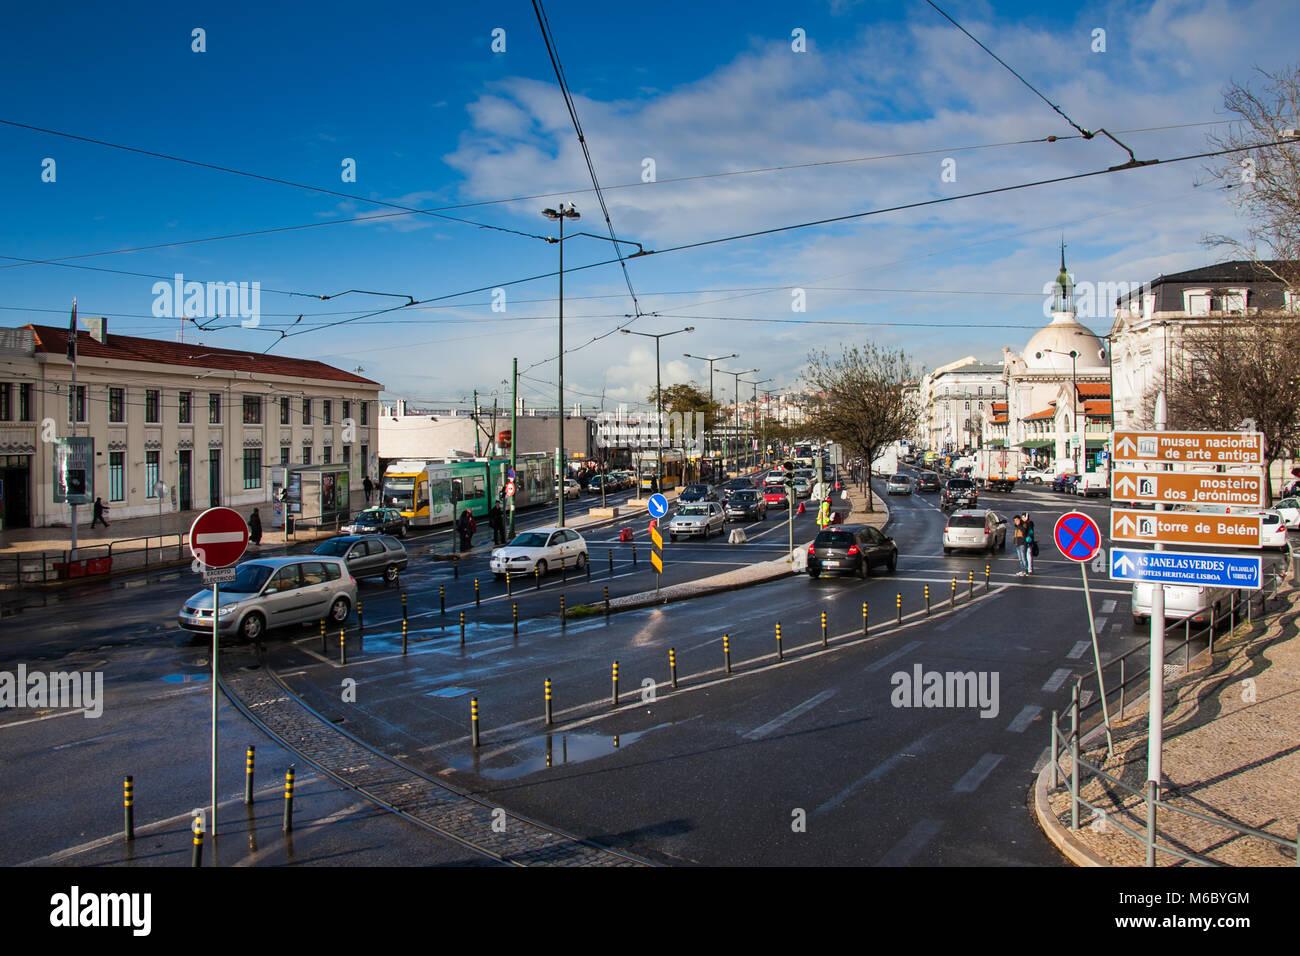 Lissabon, Portugal - Januar 27, 2011: Verkehr in der Nähe des Barrio Alto, in der Stadt Lissabon, Portugal Stockbild